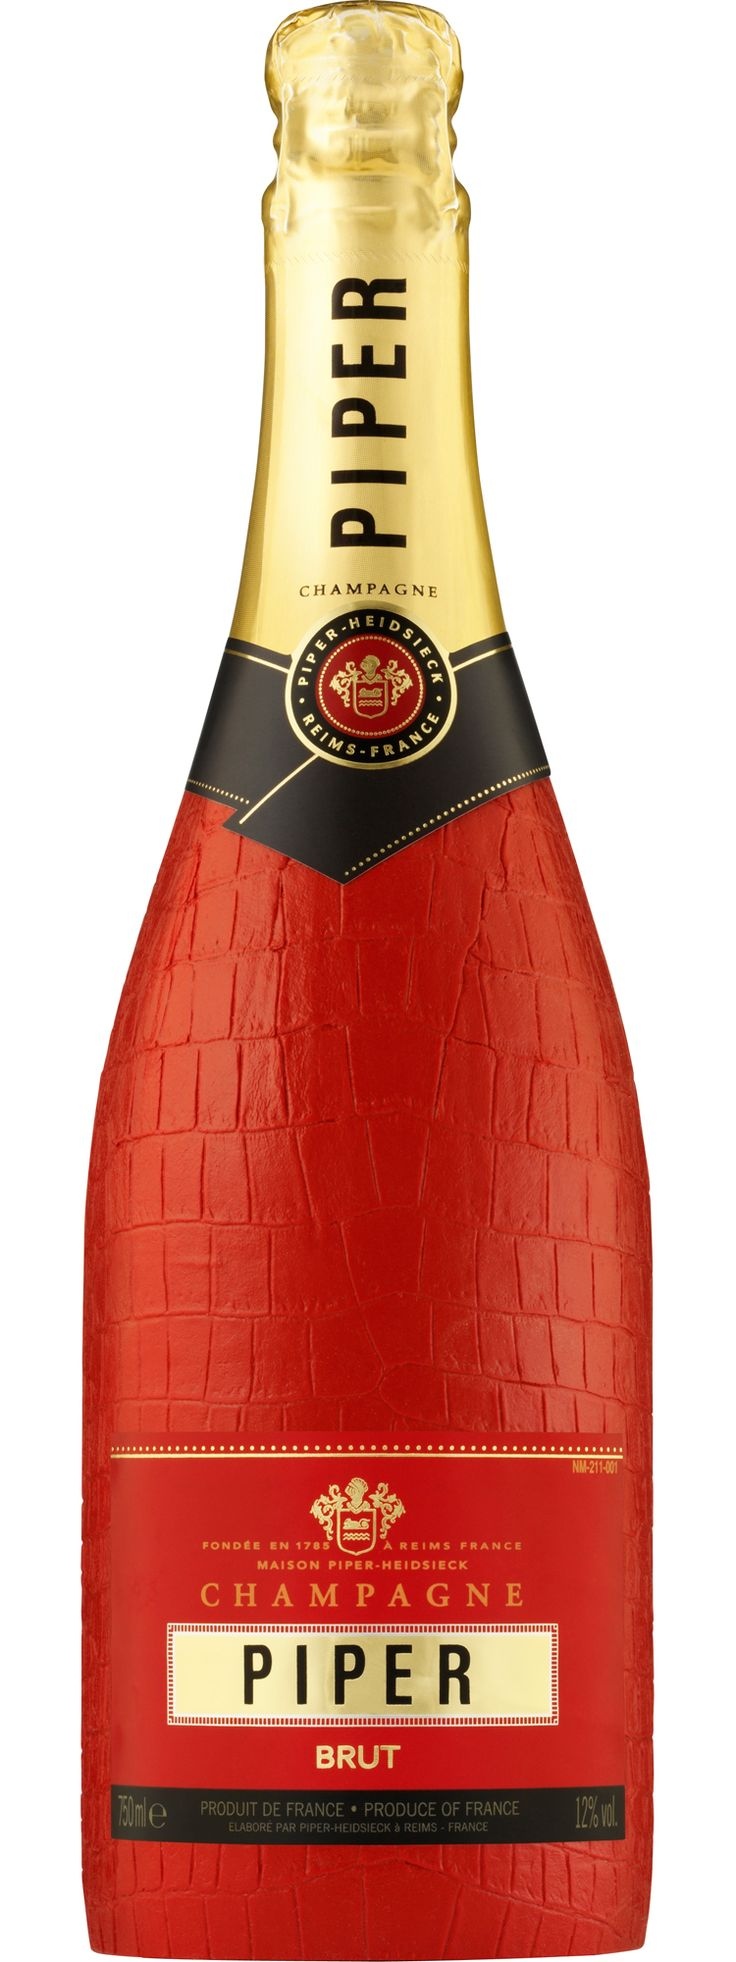 piper champagne | Piper-Heidsieck Cuvée Brut Limited Faux Crocodile Skin Edition…